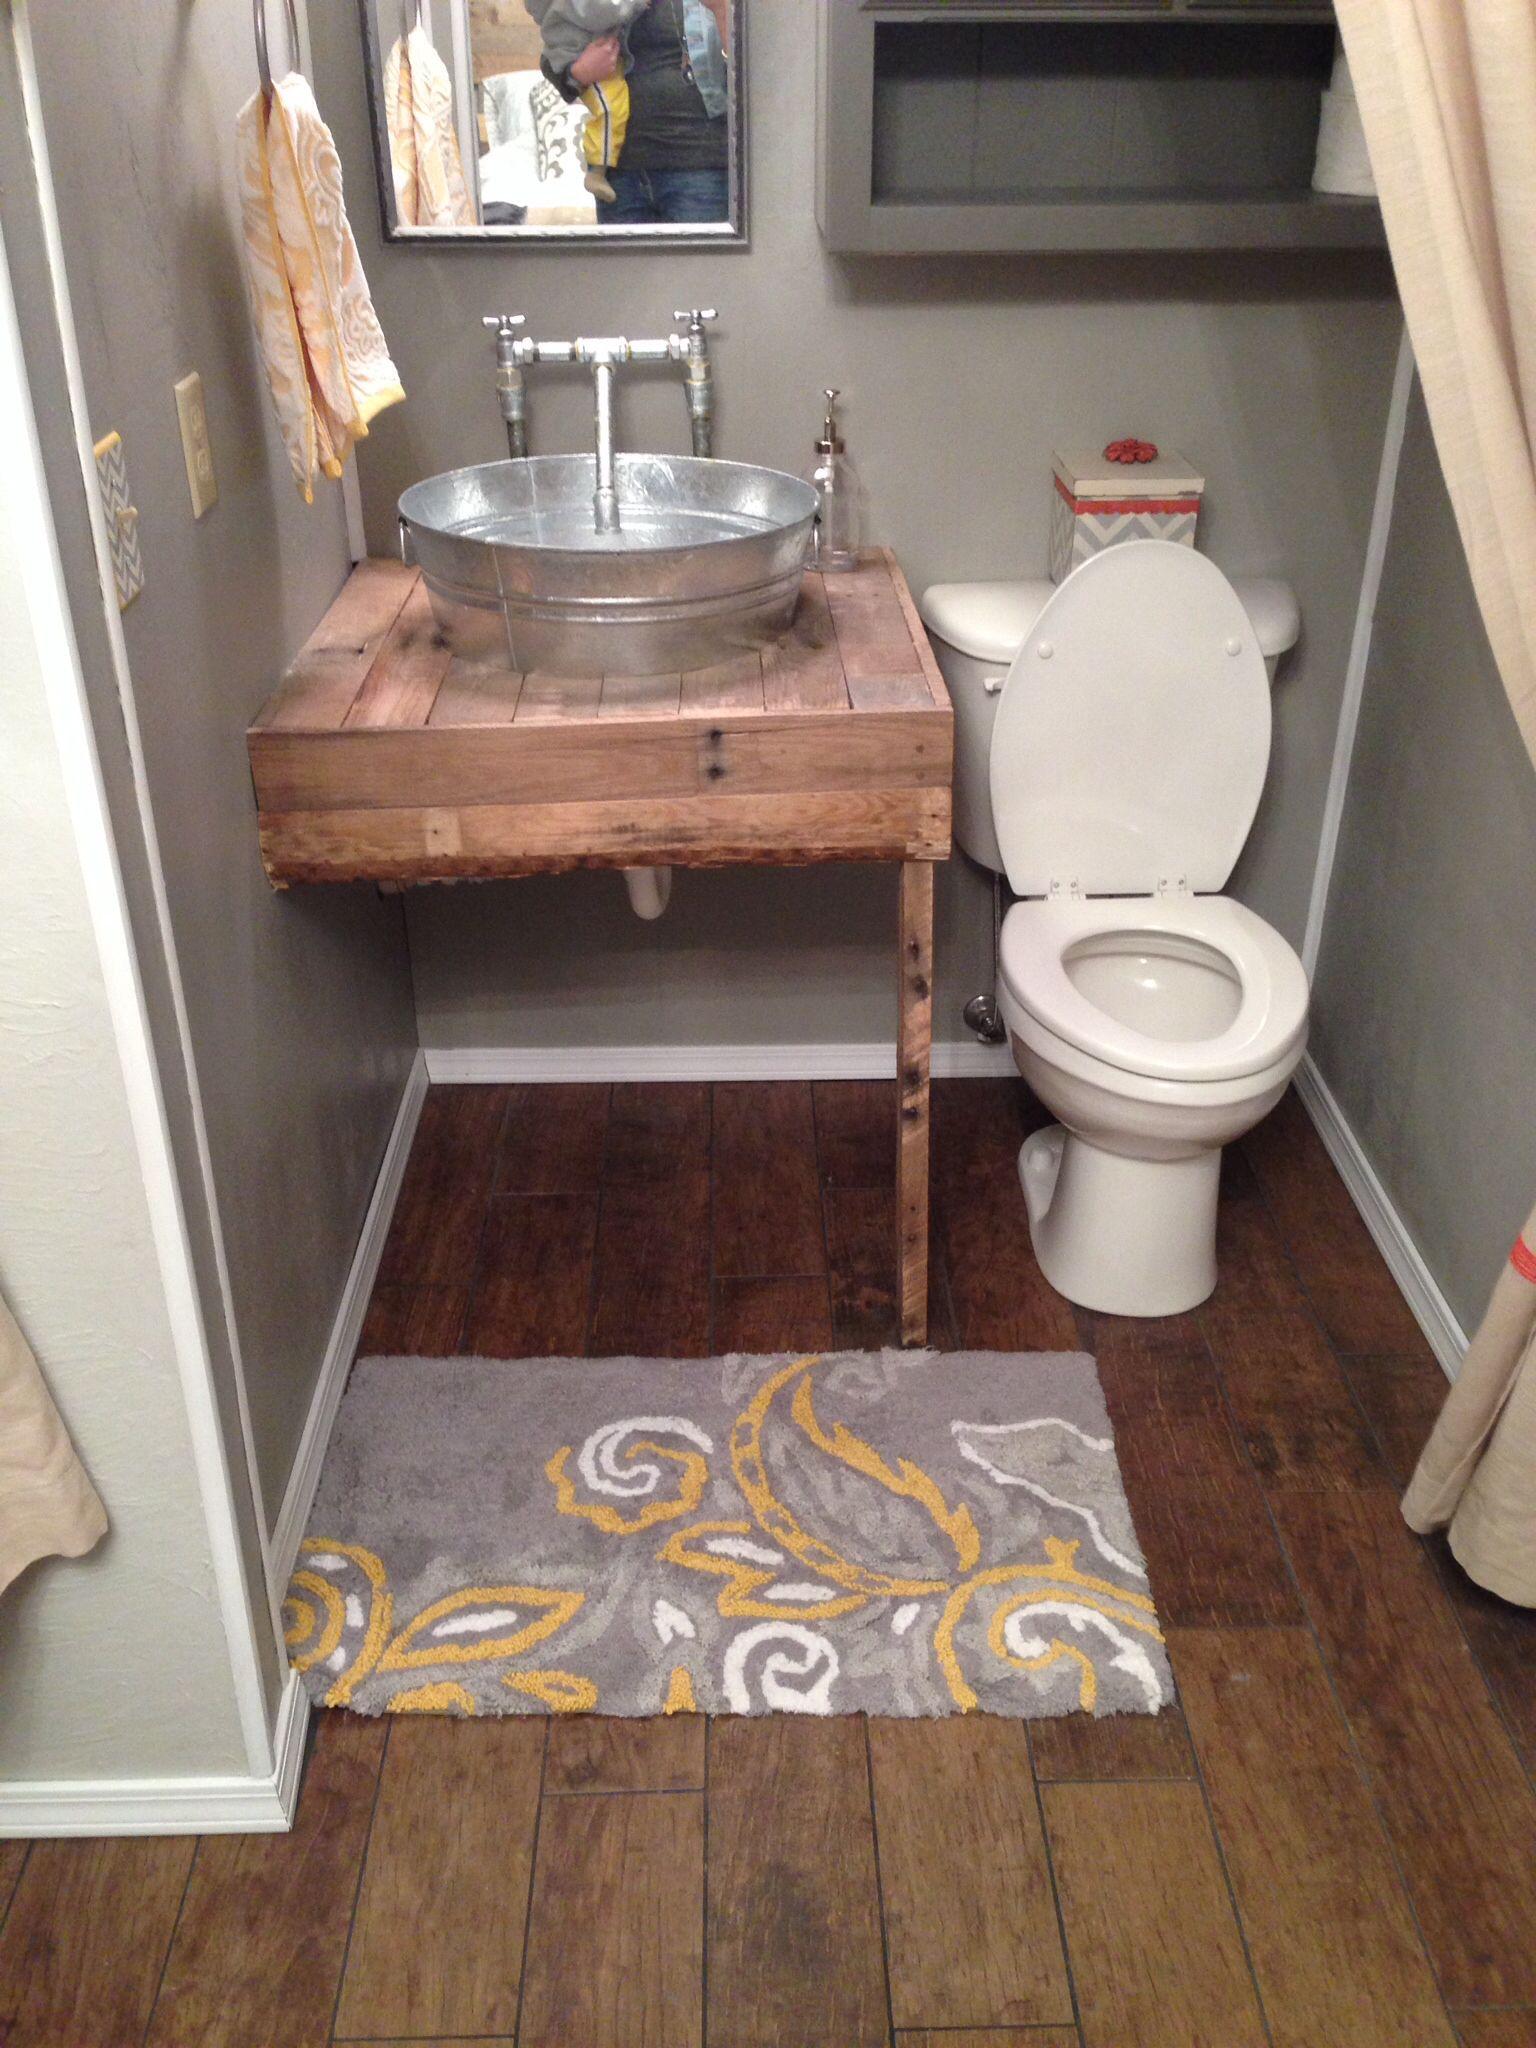 Porcelain plank floor. Pallet vanity. Galvanized sink and faucet.